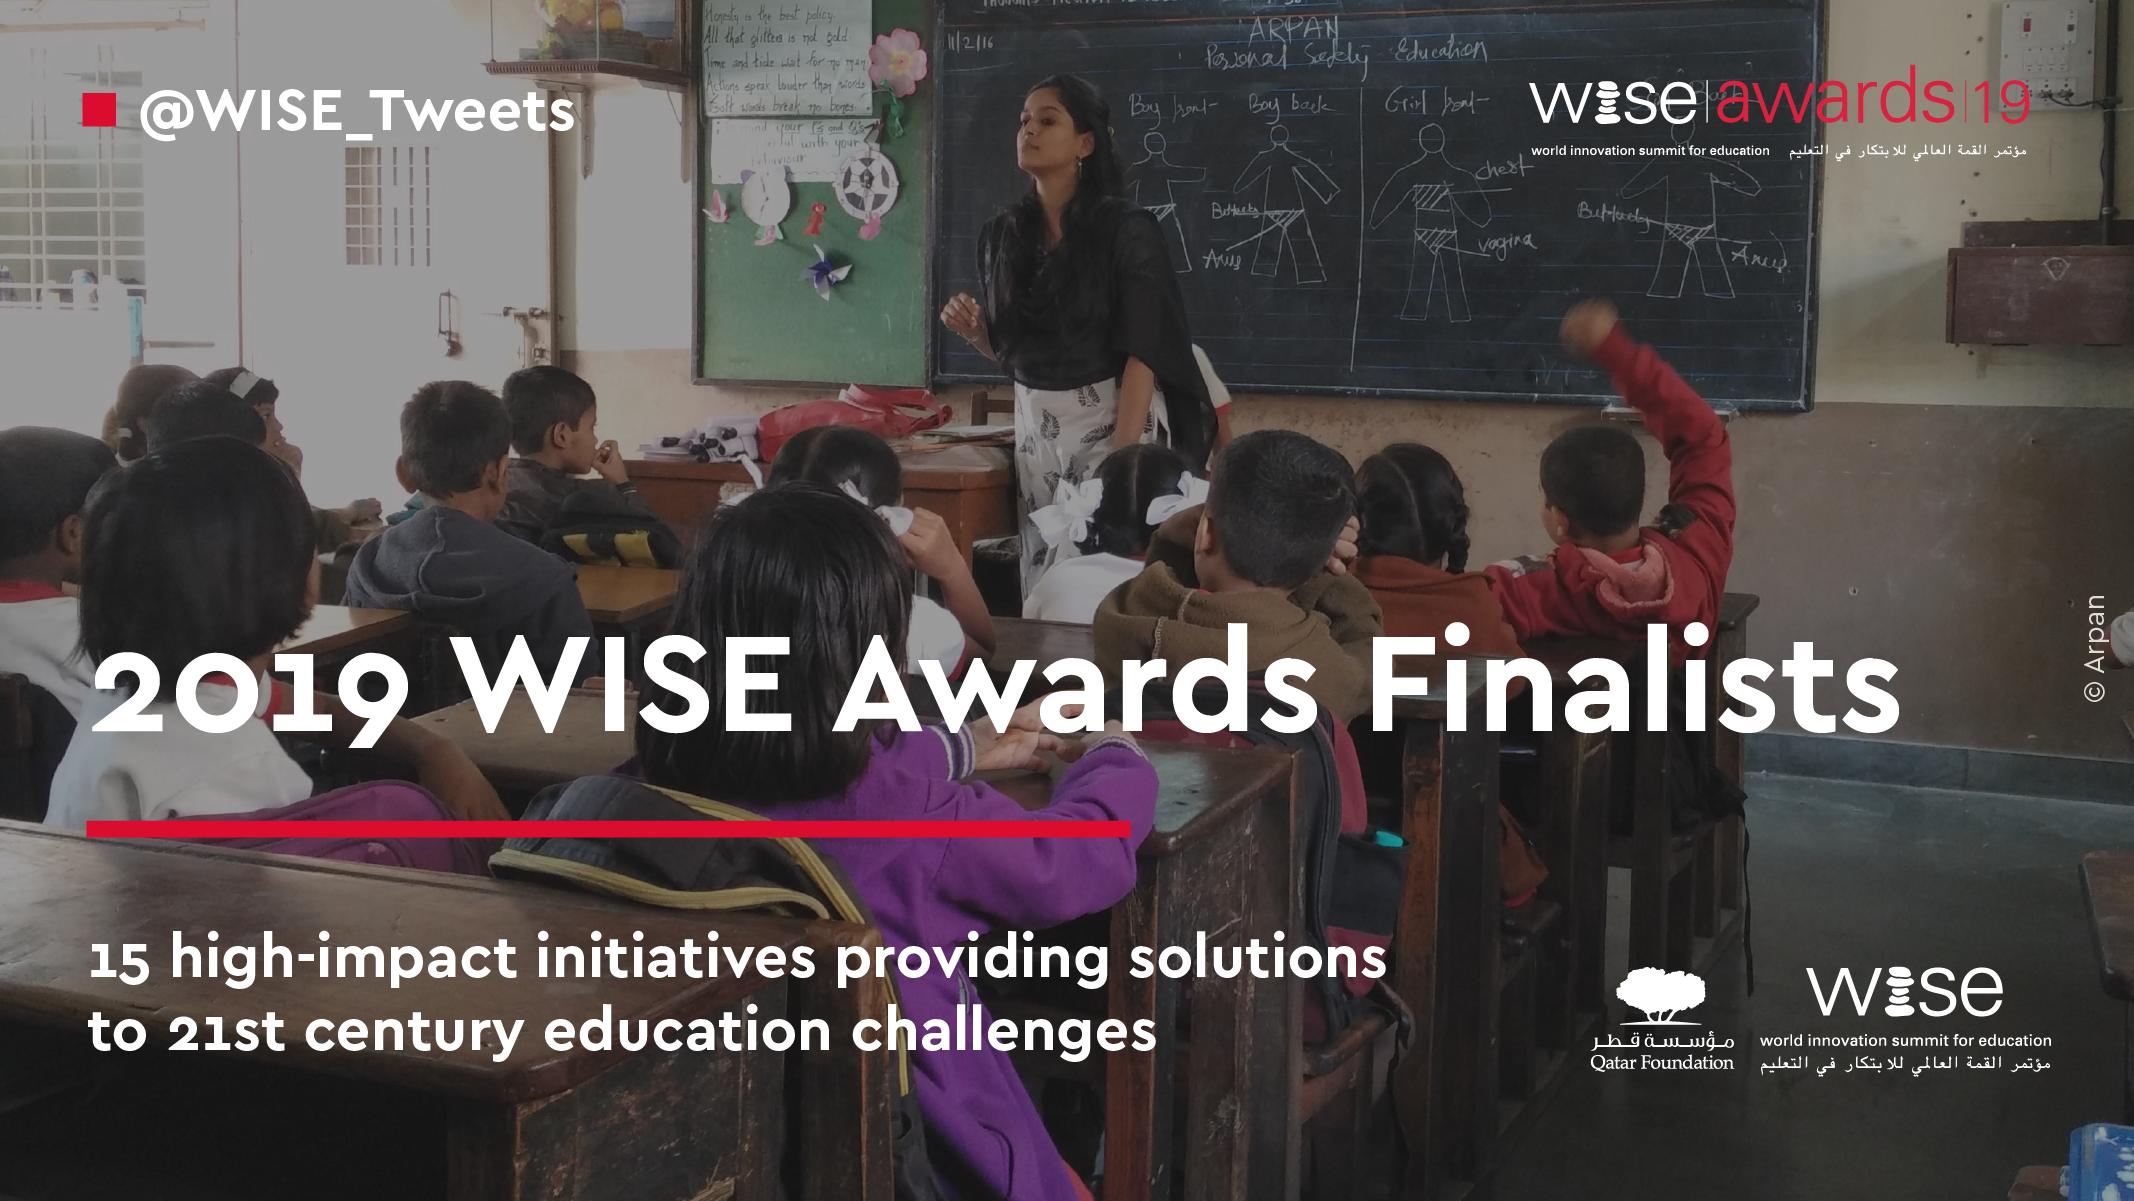 Wise Awards 2019